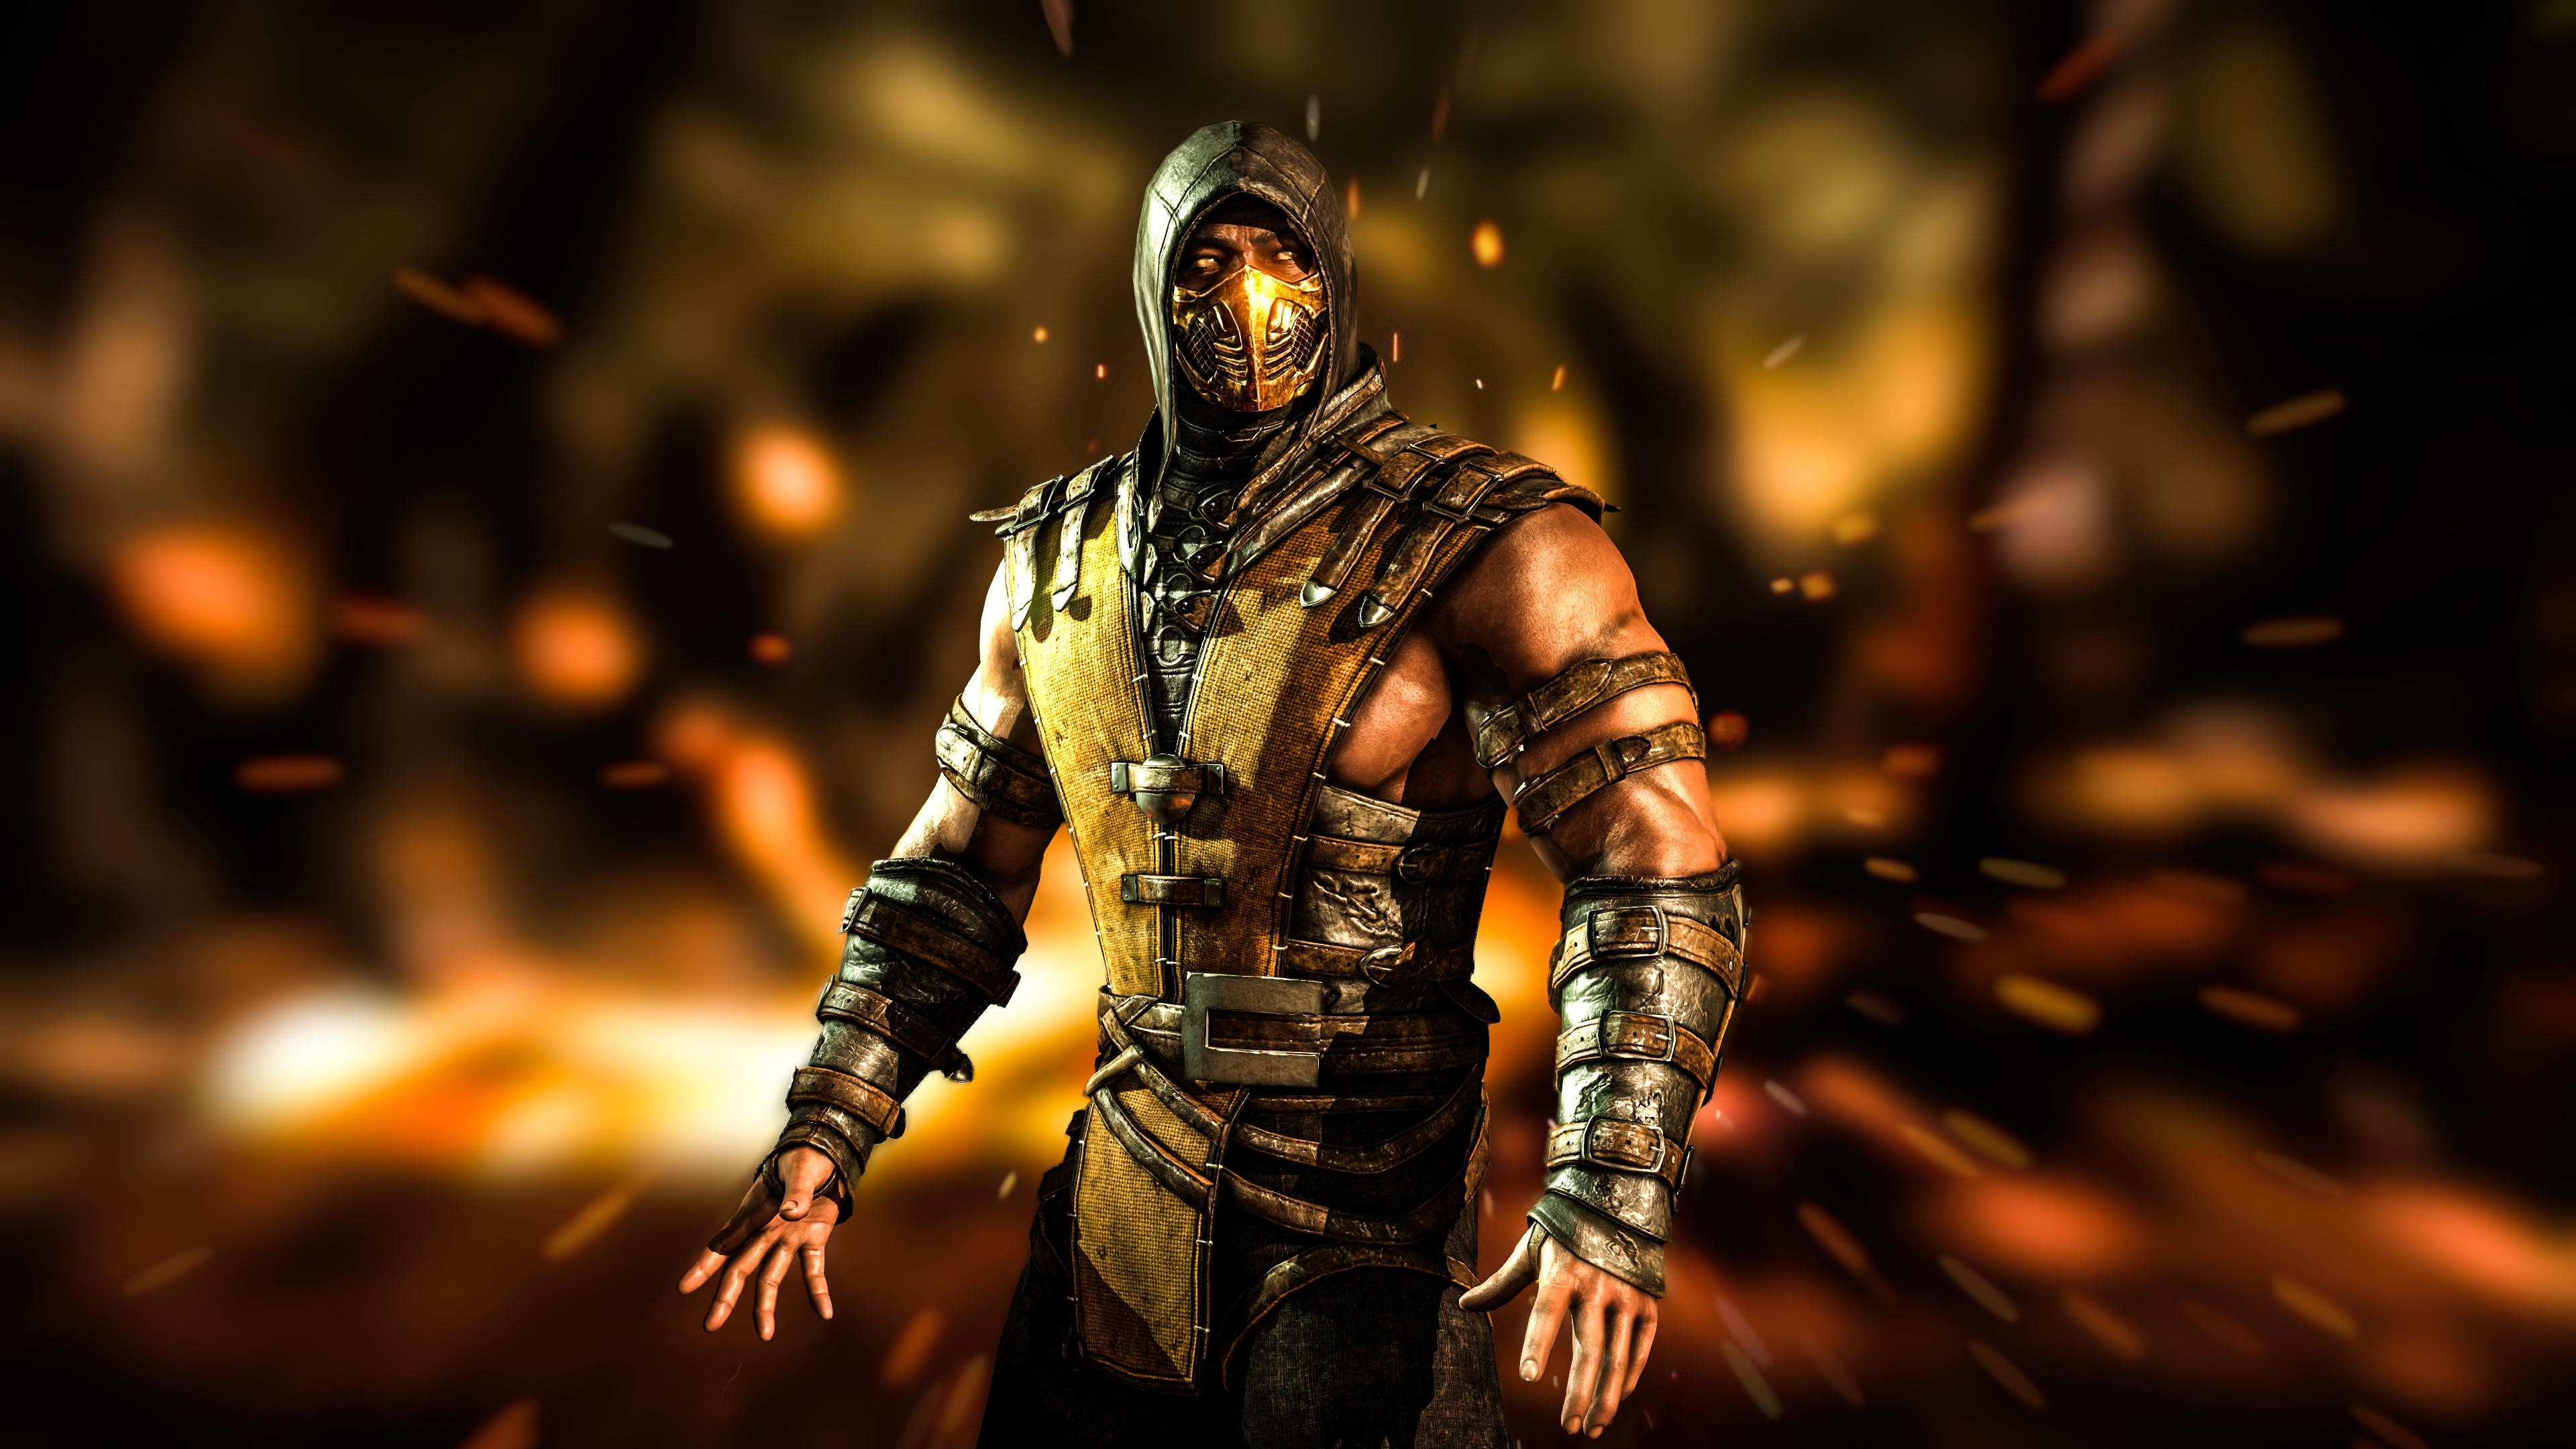 Mortal Kombat X Scorpion Wallpapers 74 Images